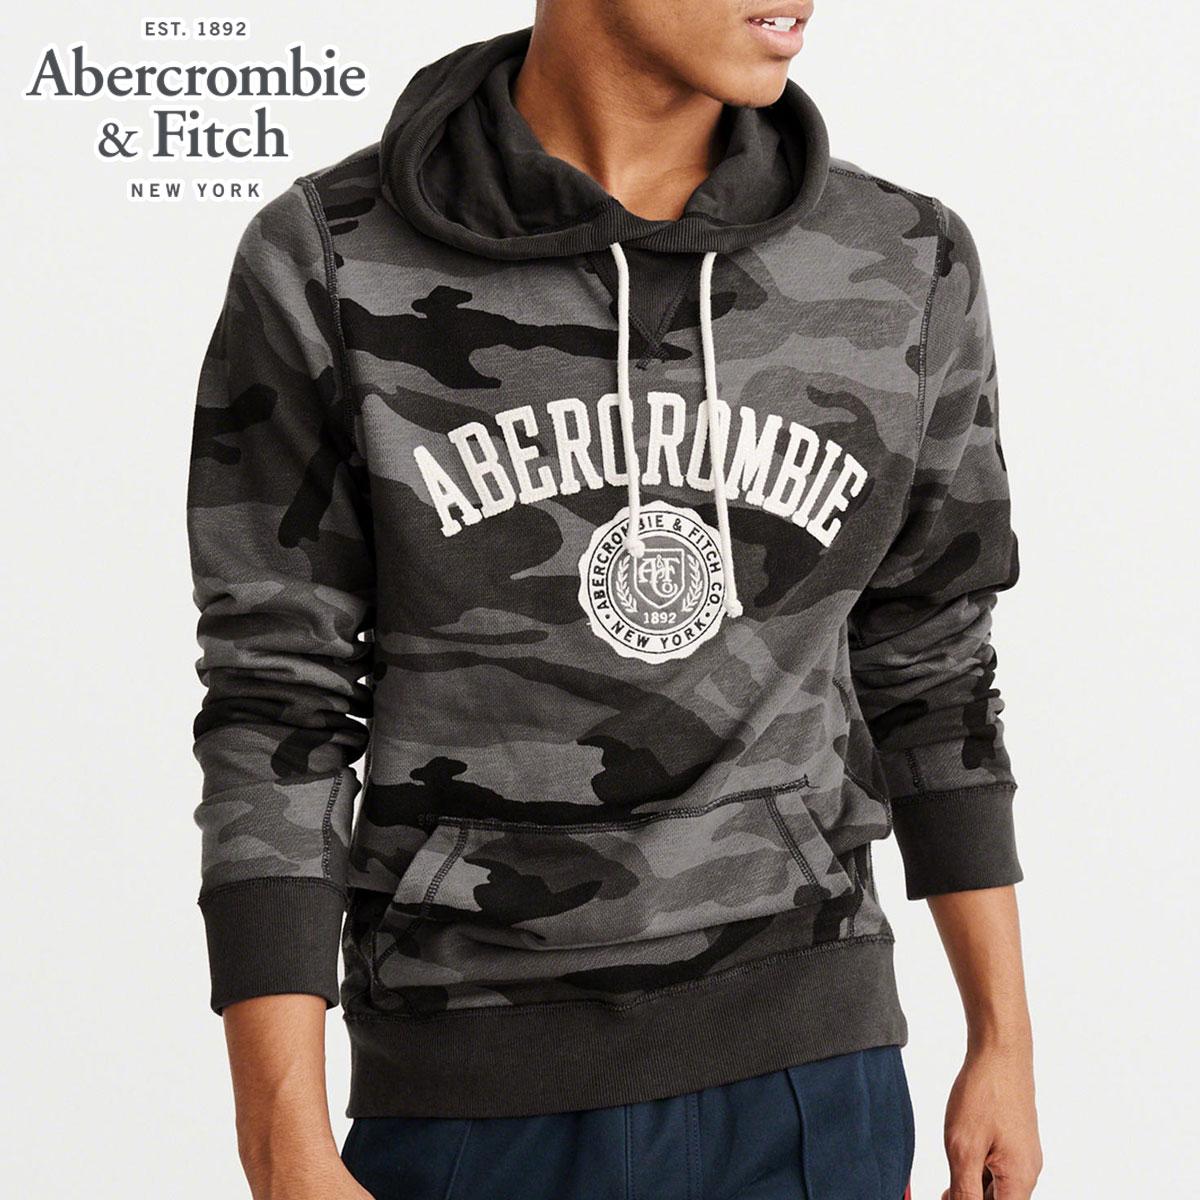 d937918577d ABBA black Abercrombie & Fitch regular article men pullover parka CAMO  LOGO HOODIE 122- ...